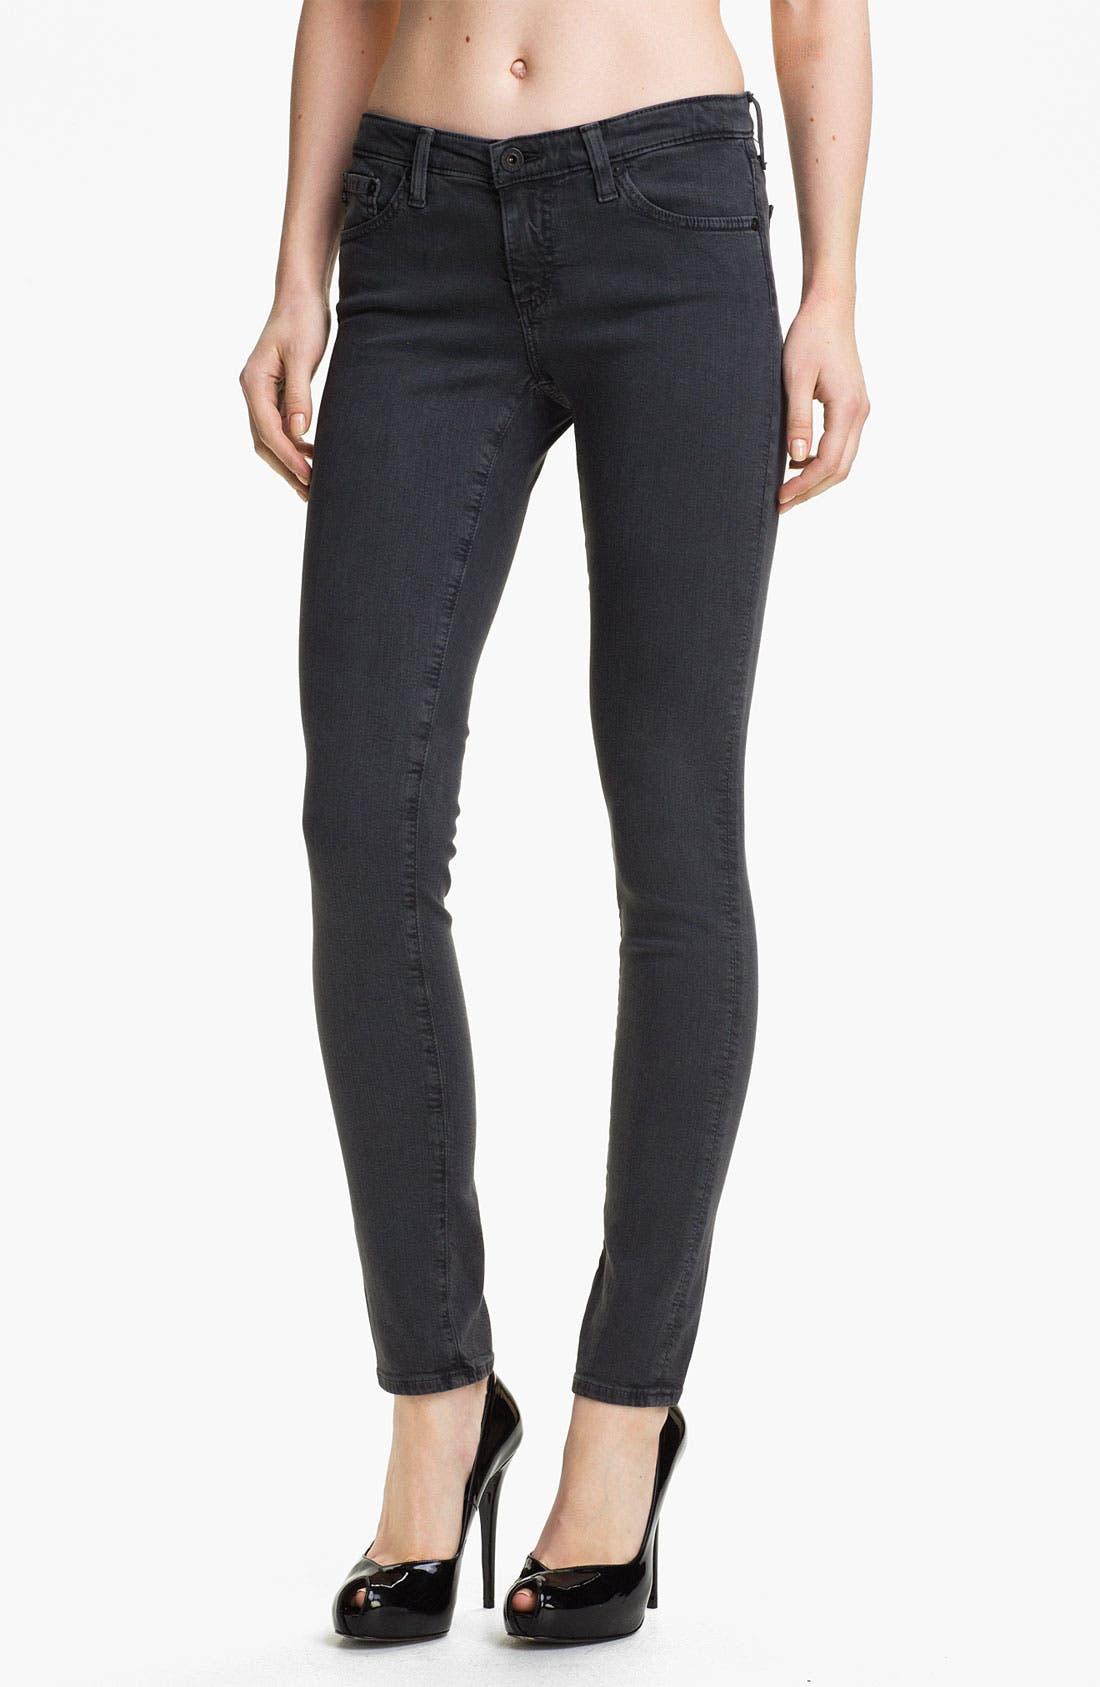 Alternate Image 1 Selected - AG Jeans 'The Legging' Super Skinny Jeans (Grey)